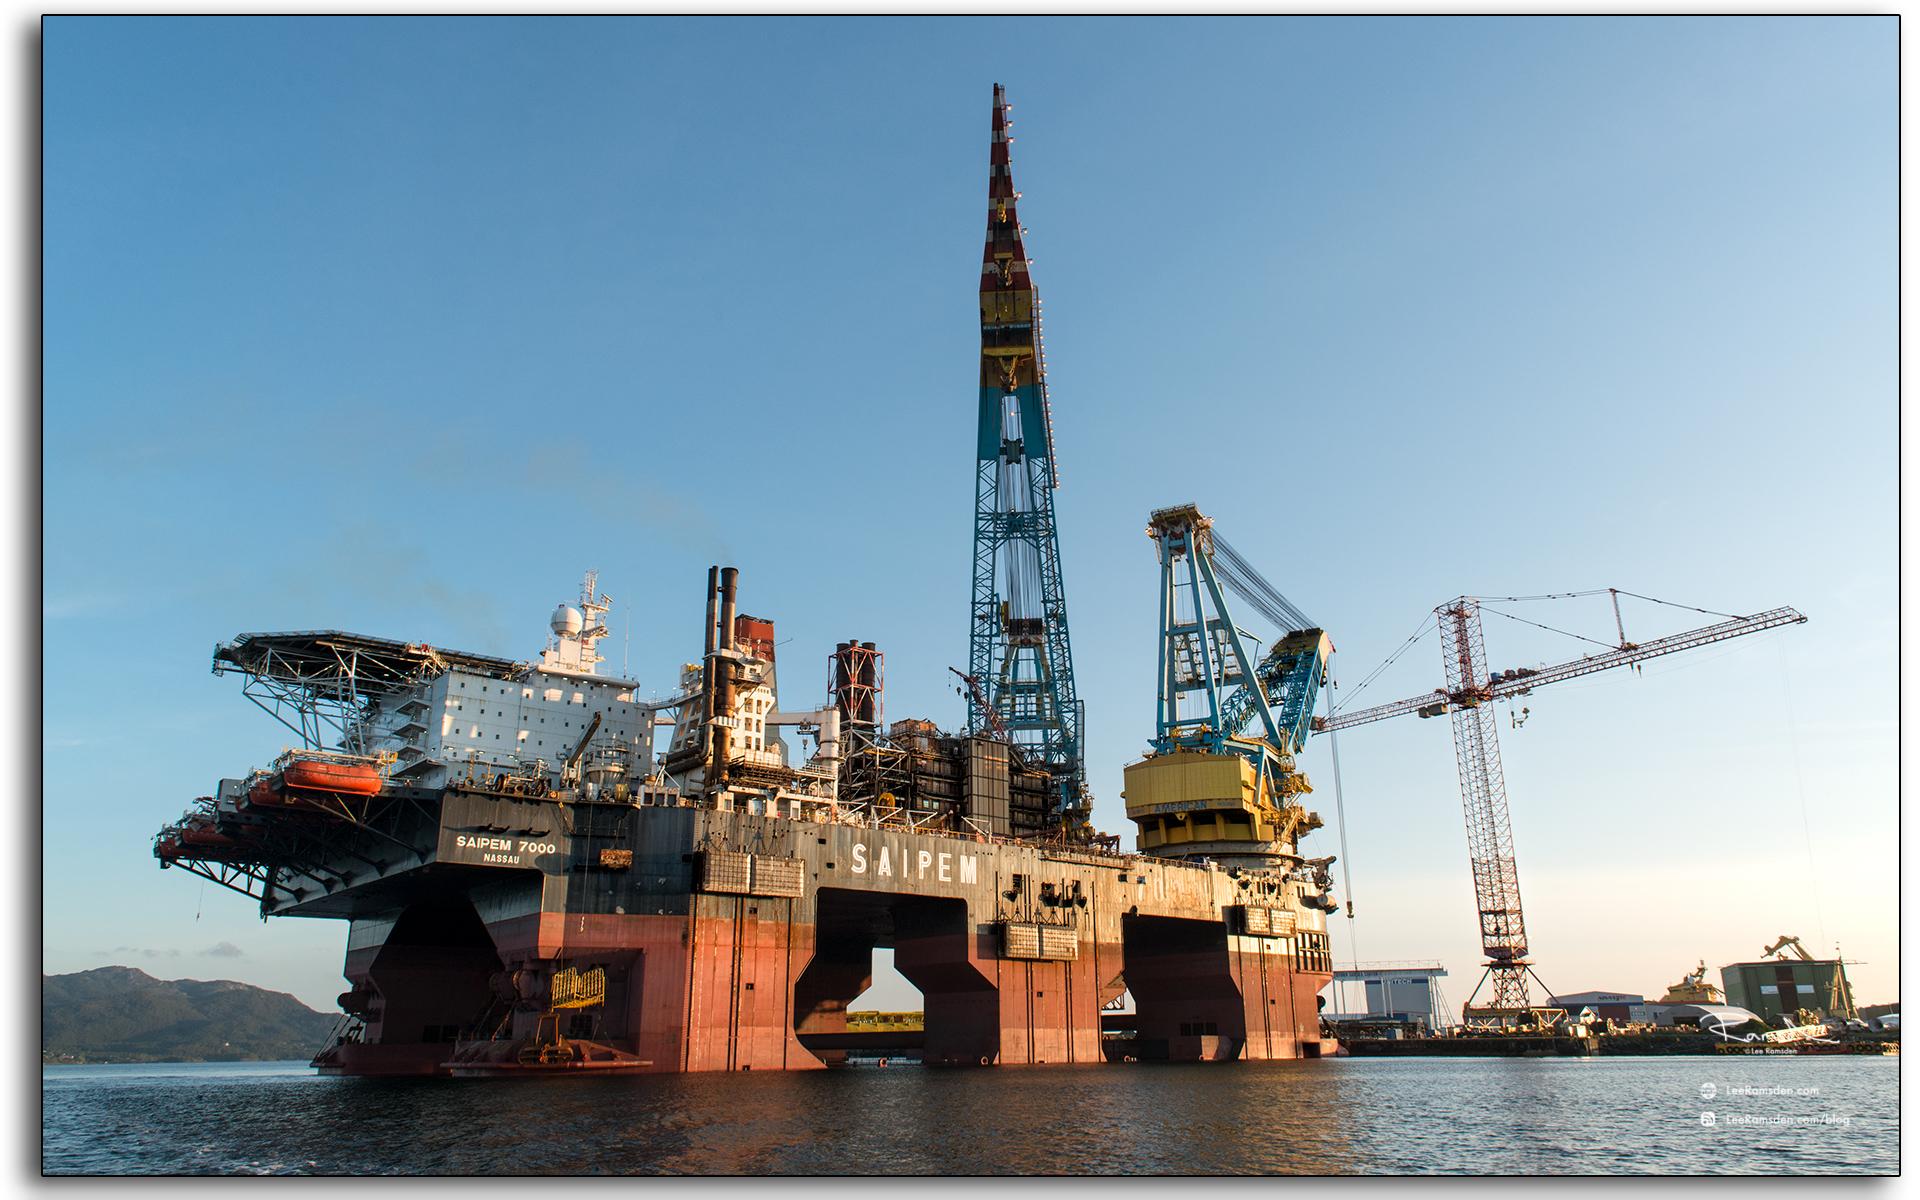 blog, Saipem S7000, heavy lifting vessel, Norway, Stavanger